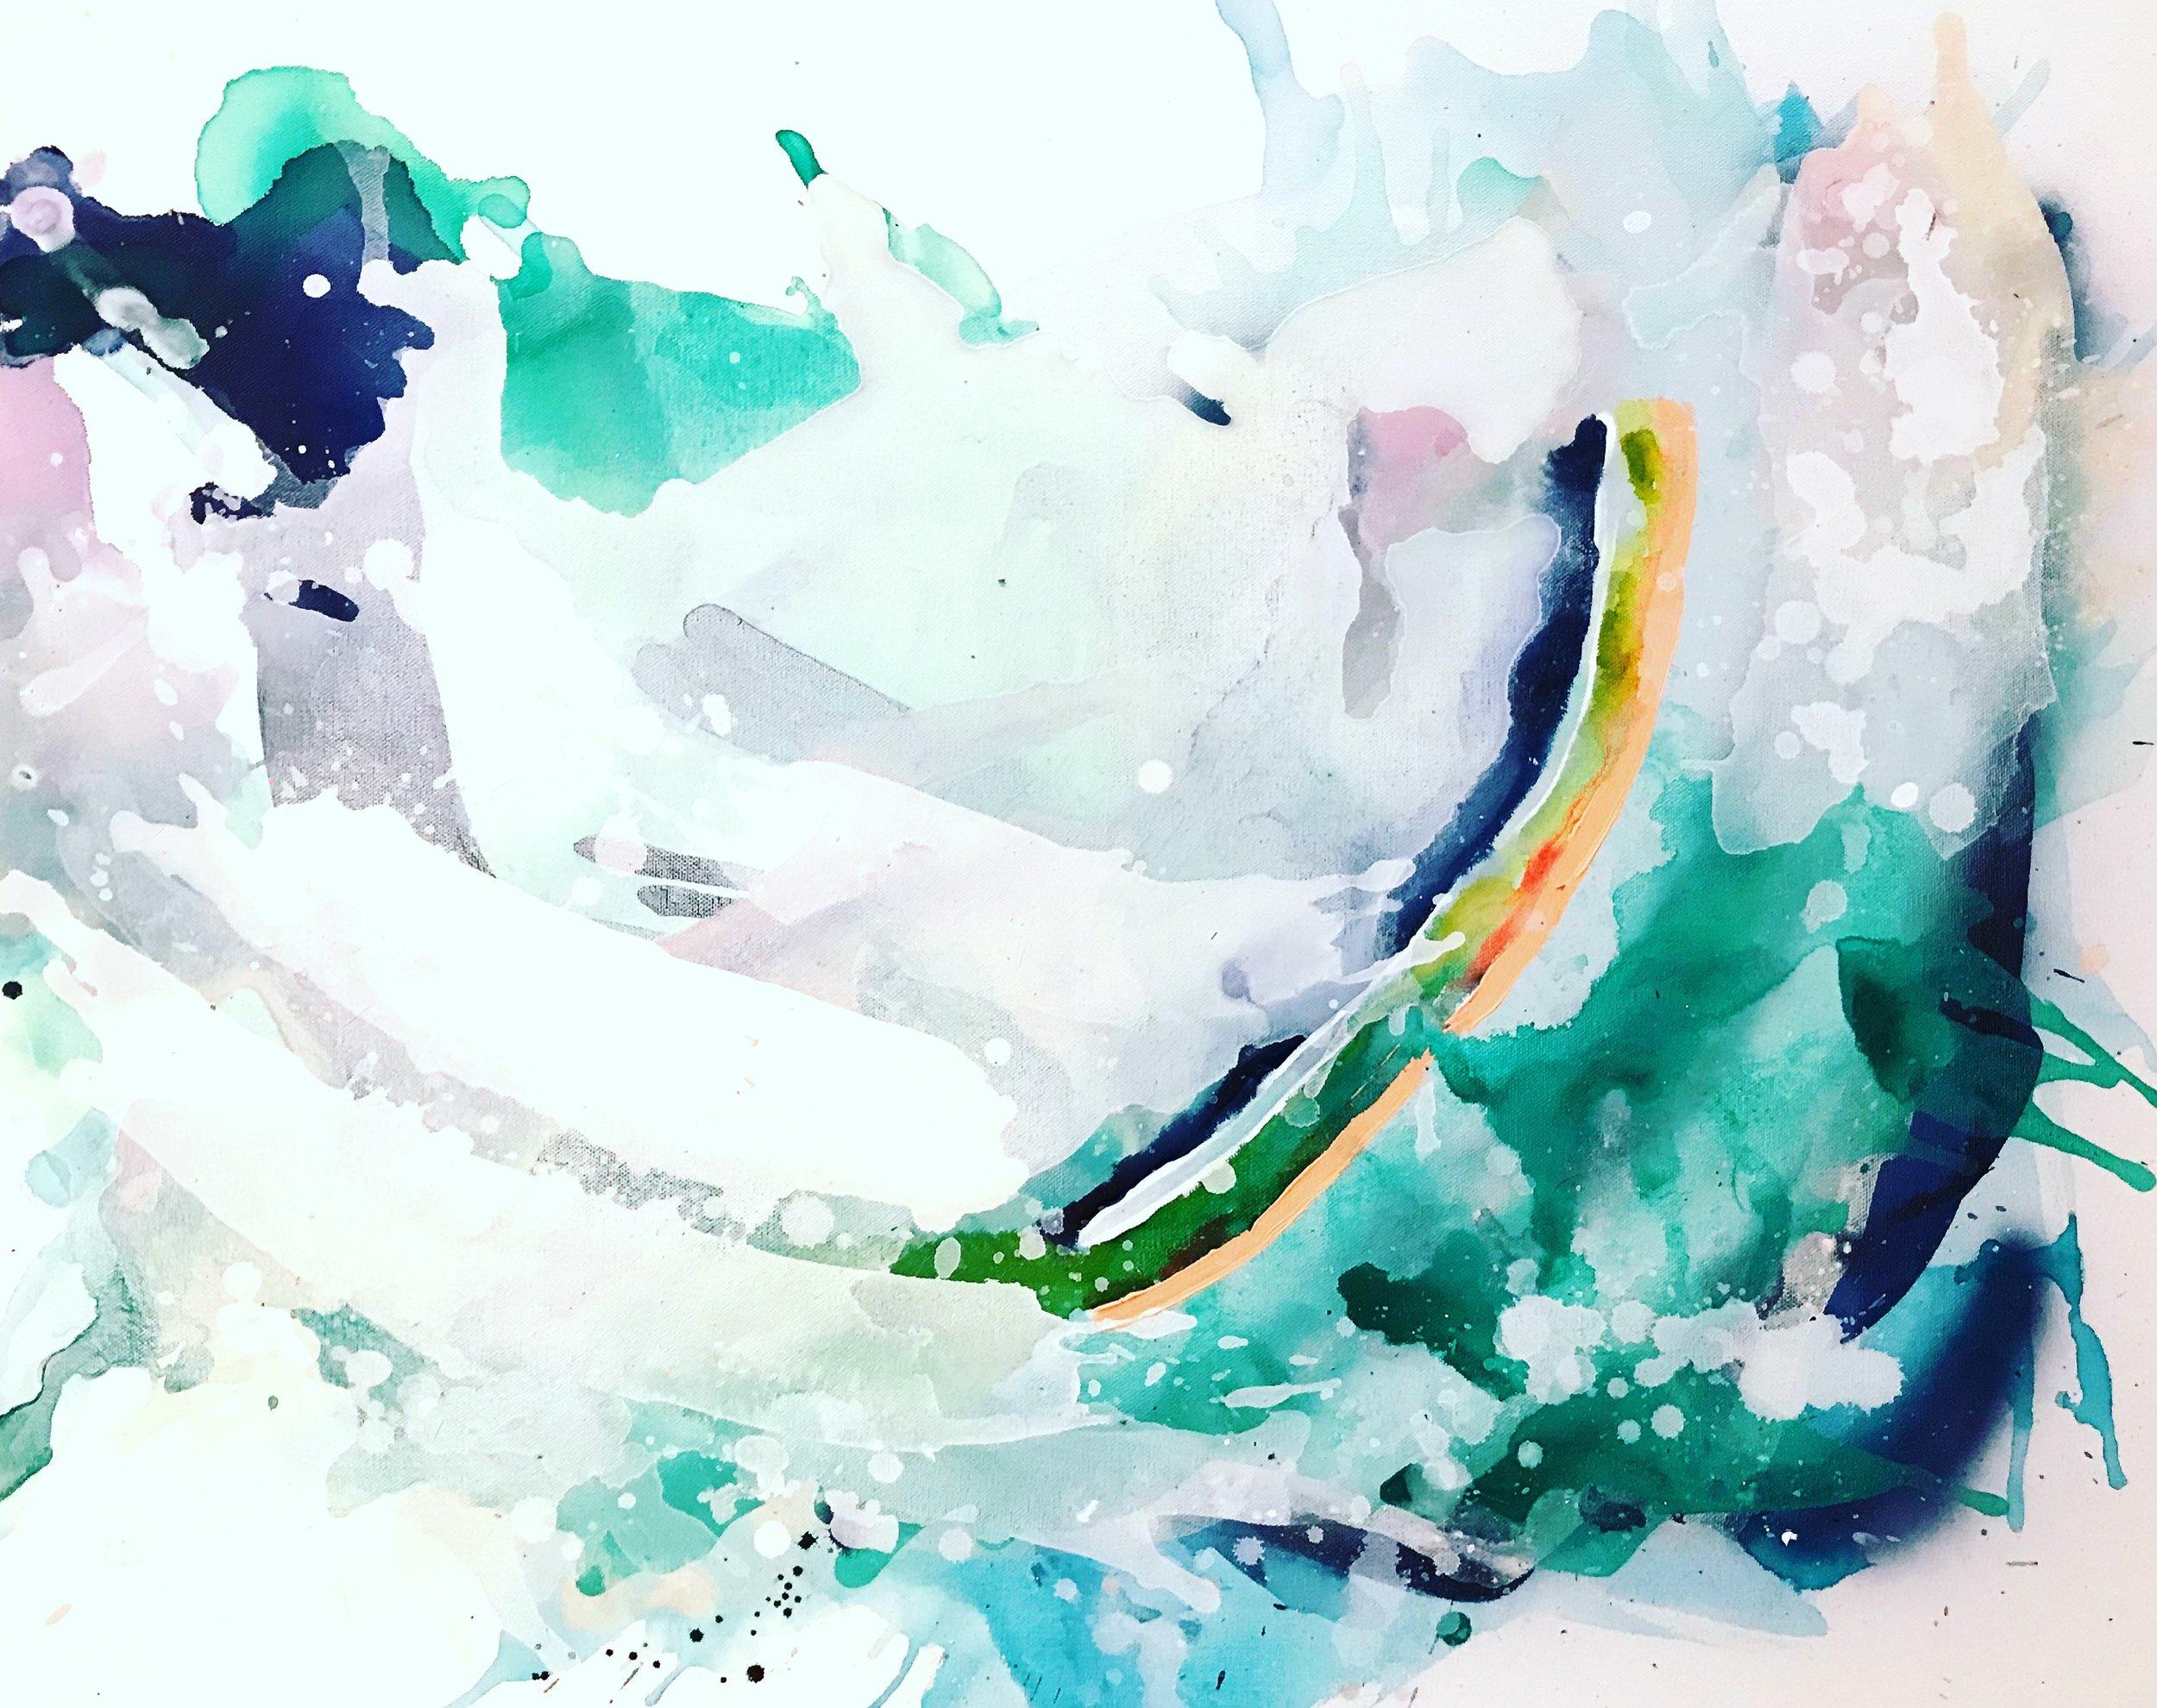 Emerald Lake_Abstract Painting.jpg